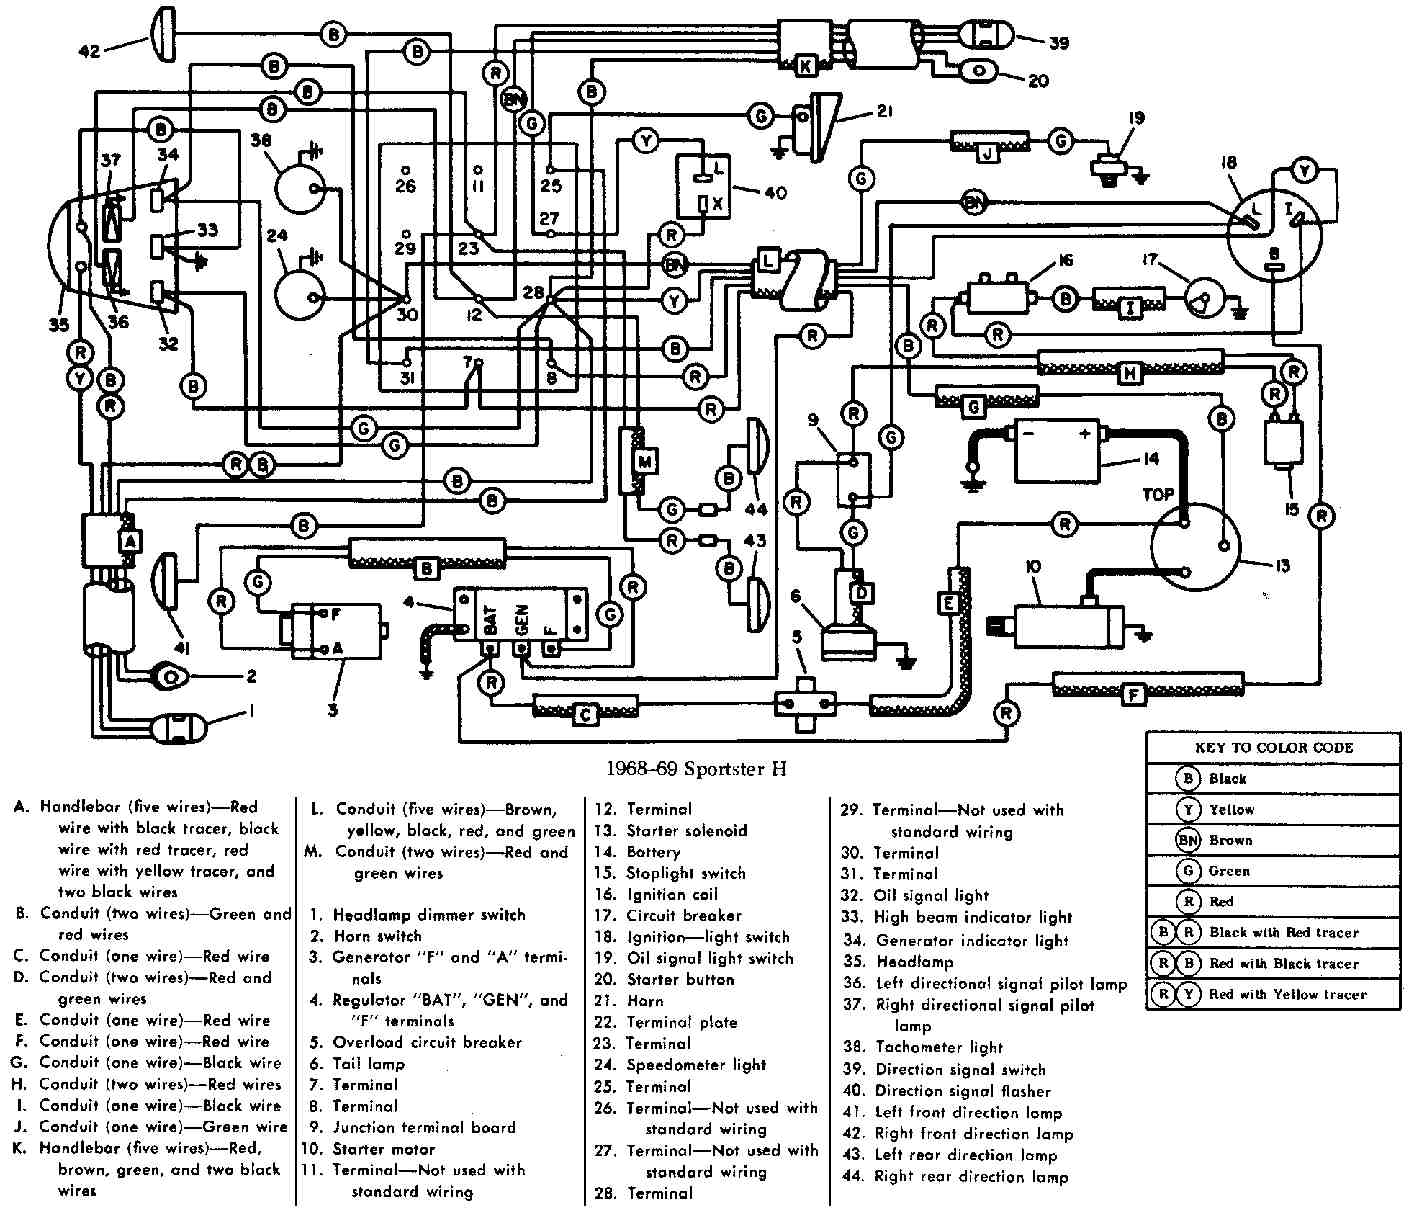 2002 Yamaha Outboard Wiring Diagram Photo Album Wire Diagram – Xv250 Wiring-diagram